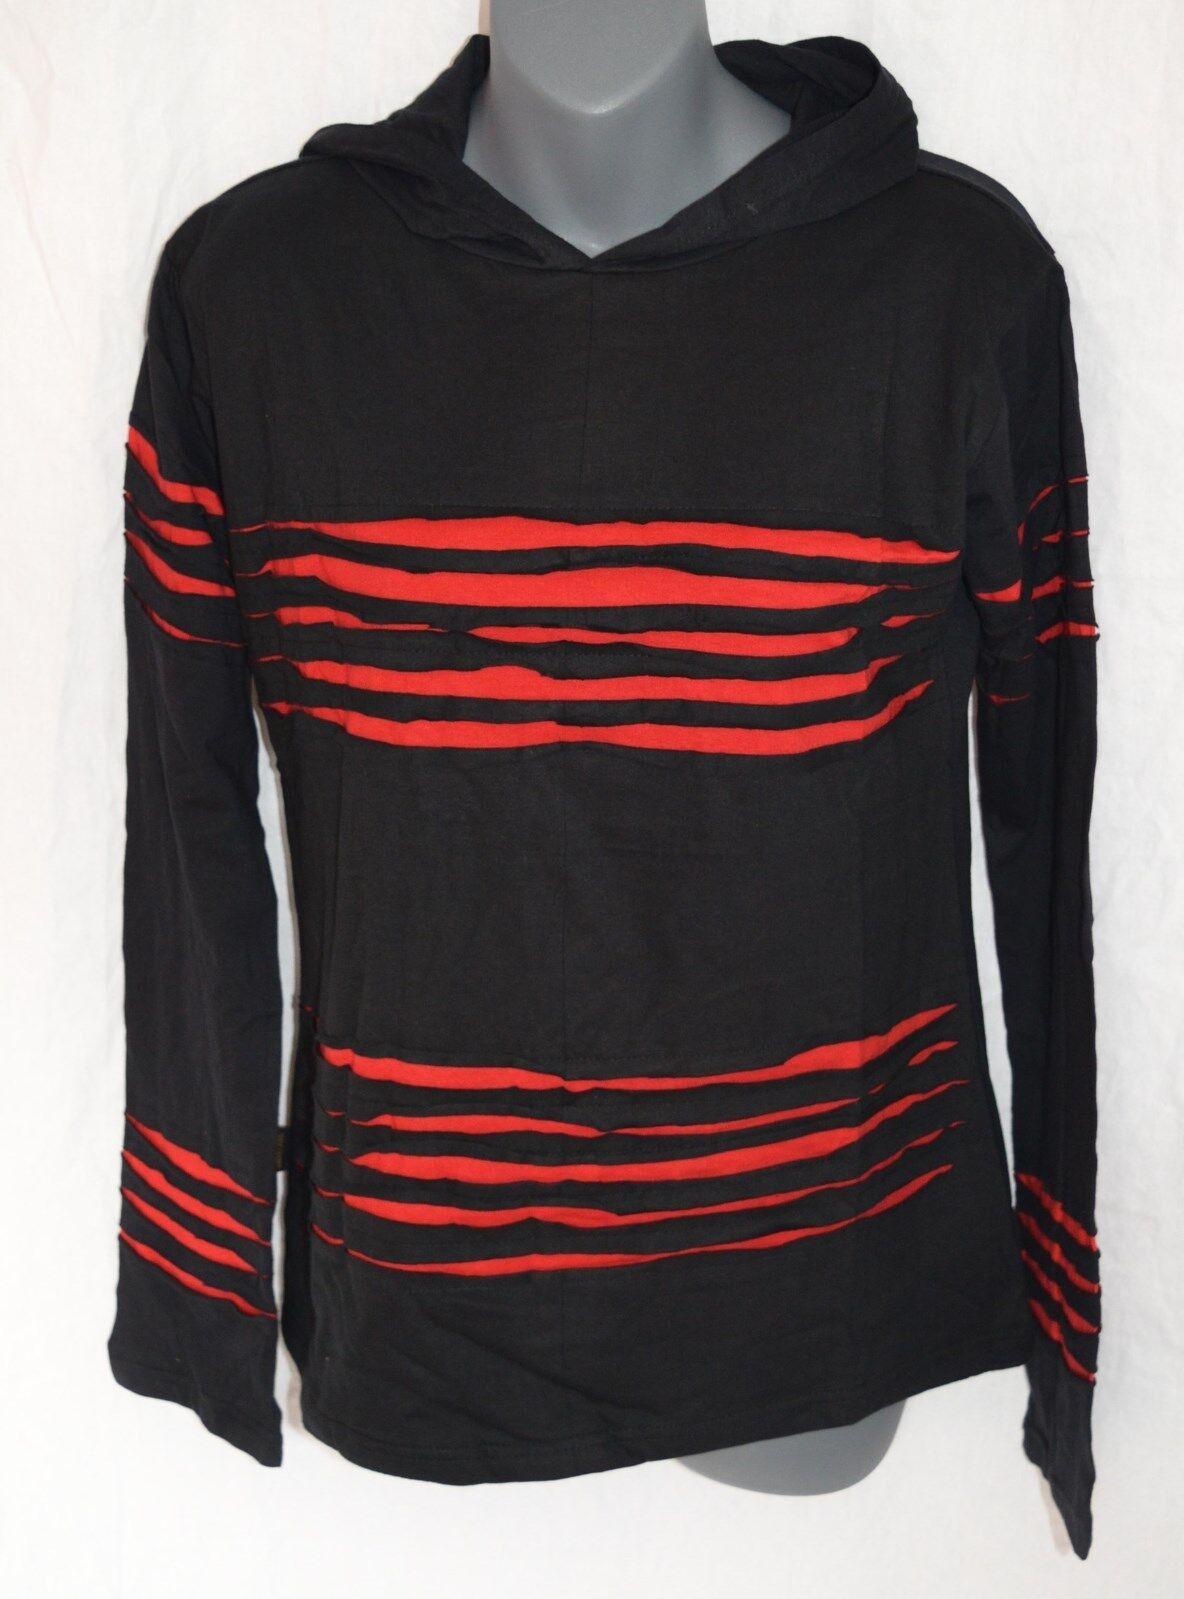 FAIR TRADE Langarm Shirt mit Kapuze_Razor Cut_ Goa, Naturmode